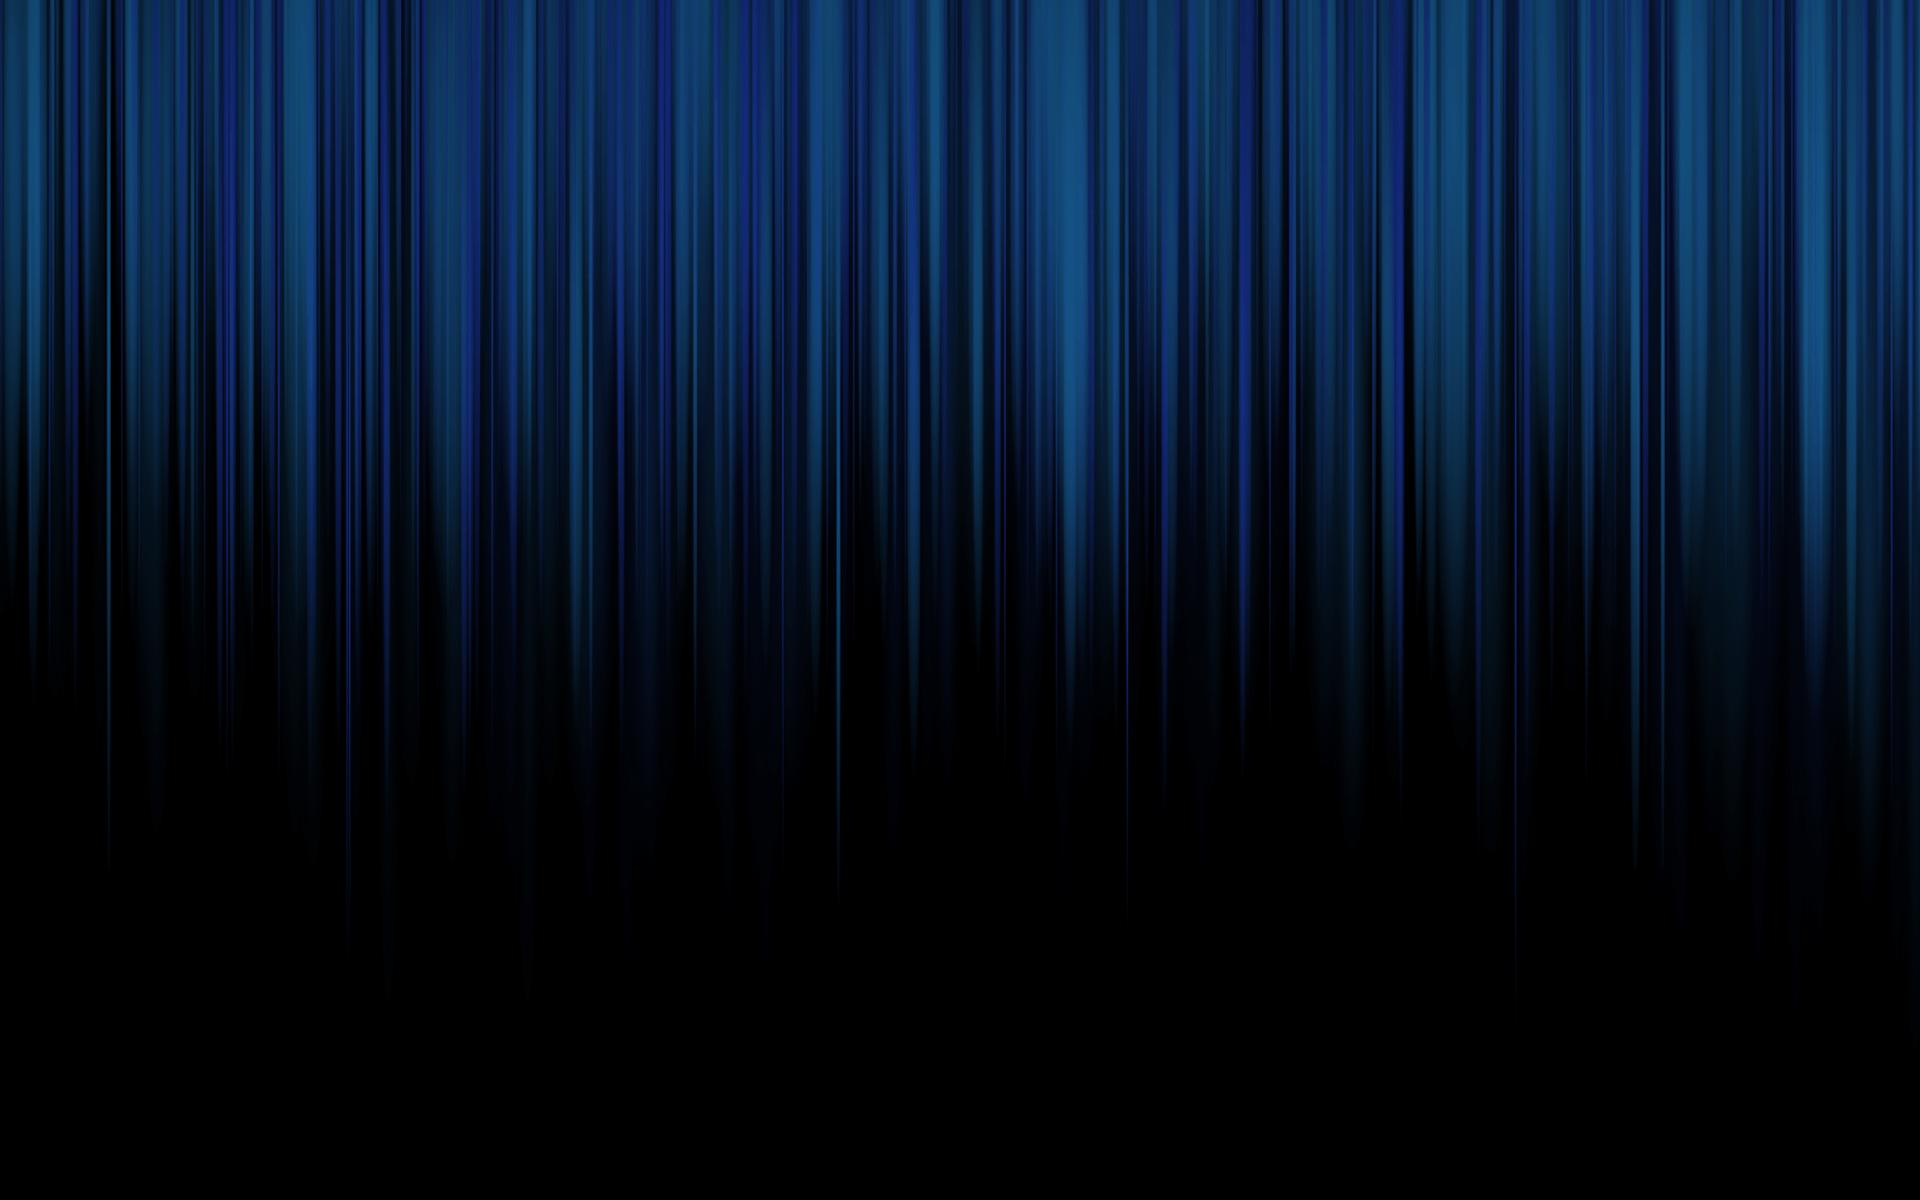 Hd wallpaper png - Wallpapers Room_com___midnight_dual_left_by_smartrams_1920x1200